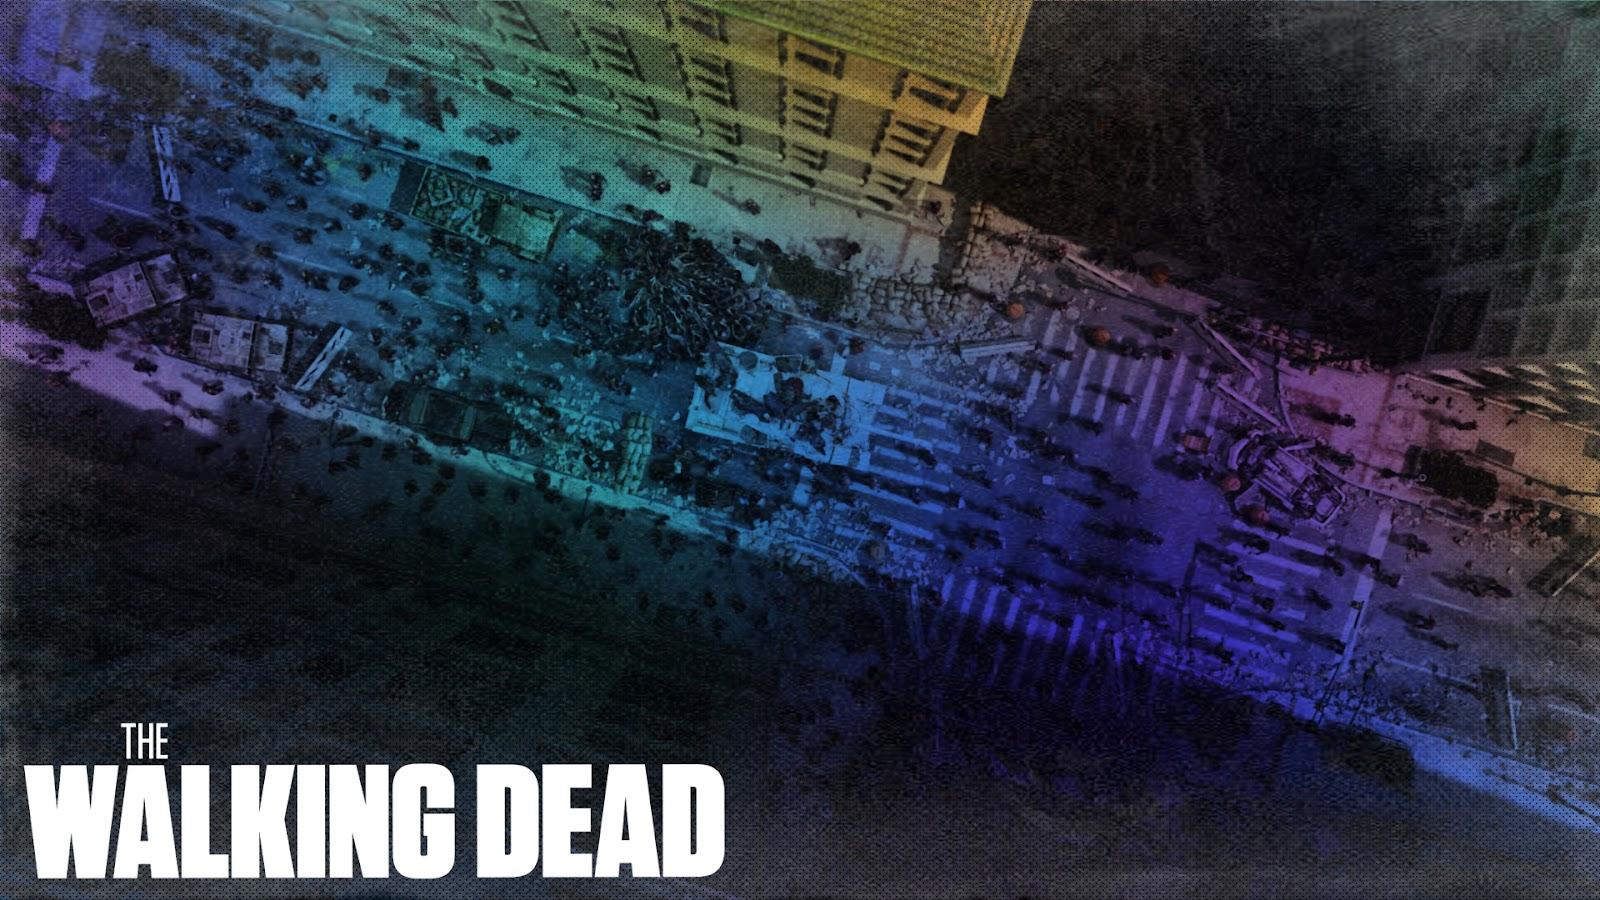 http://3.bp.blogspot.com/-NWtLfbydbG8/UCS_VFBQlqI/AAAAAAAALz4/M5XeLH8WbeI/s1600/walking-dead-zombies.jpg